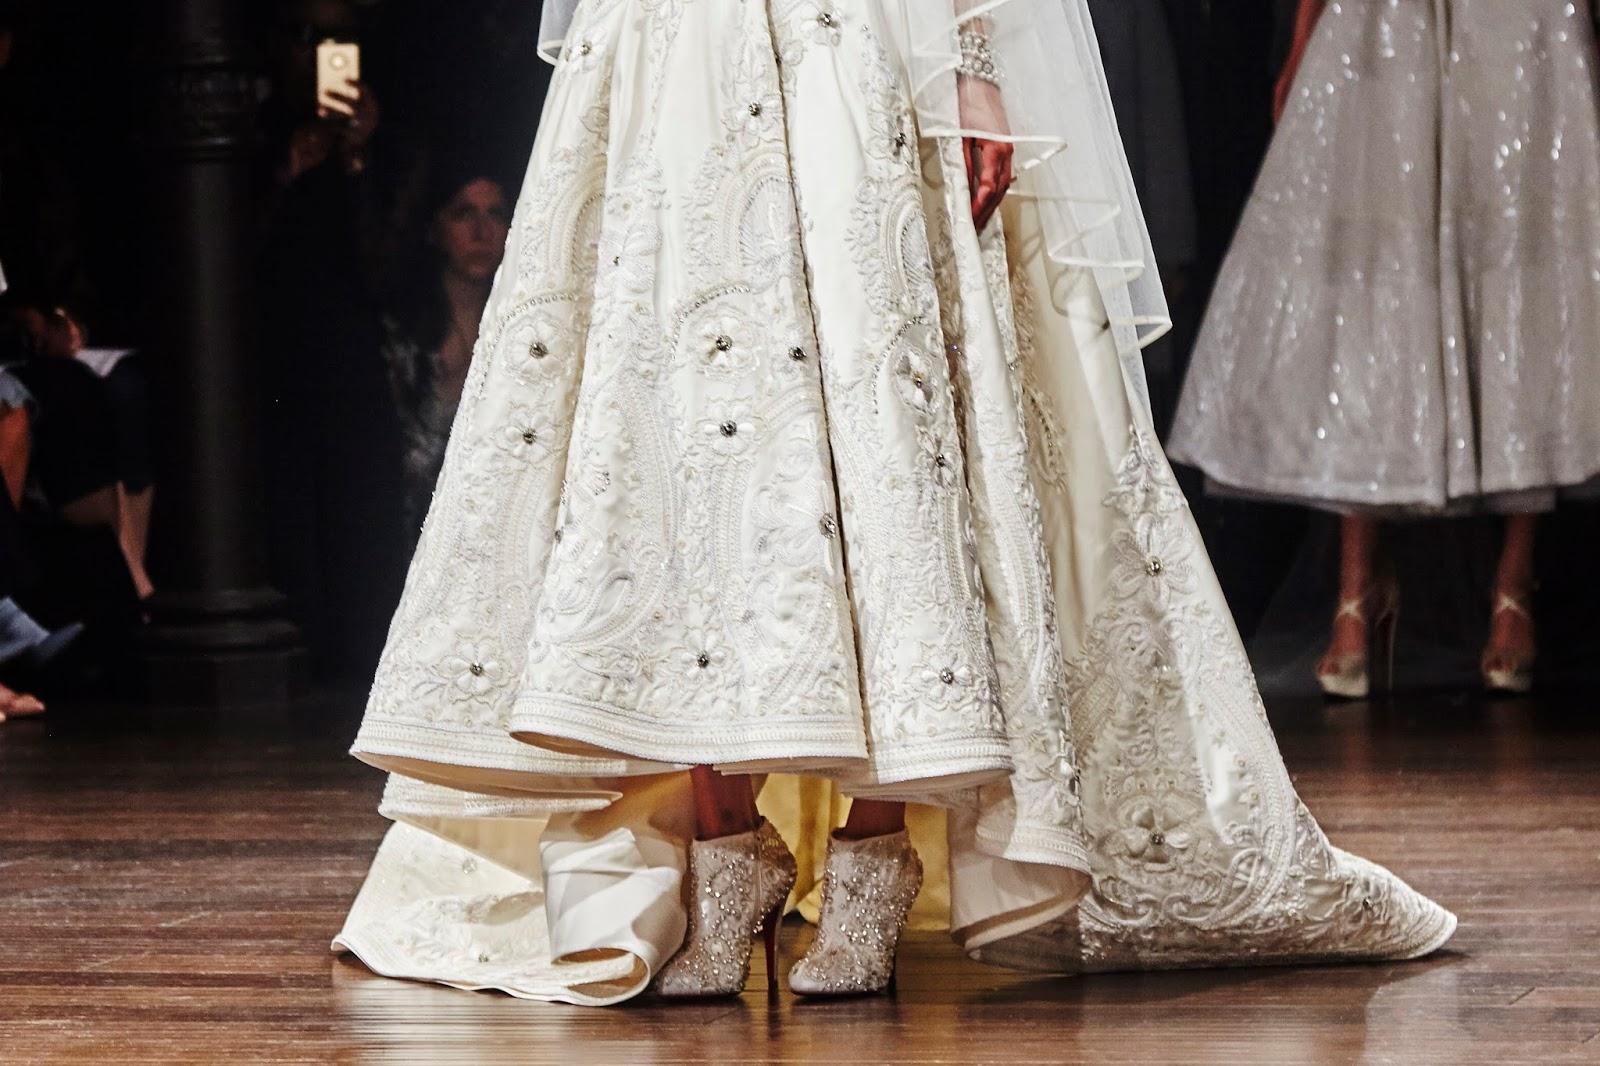 6284298c9 سوف تتالق العروس و هي ترتدي حذاء كريستيان لوبوتان من طراز البوت ، و المطرز  بالفصوص البراقة ، ليكمل روعة فساتين الزفاف الفخمة التي صممها المصمم الشهير